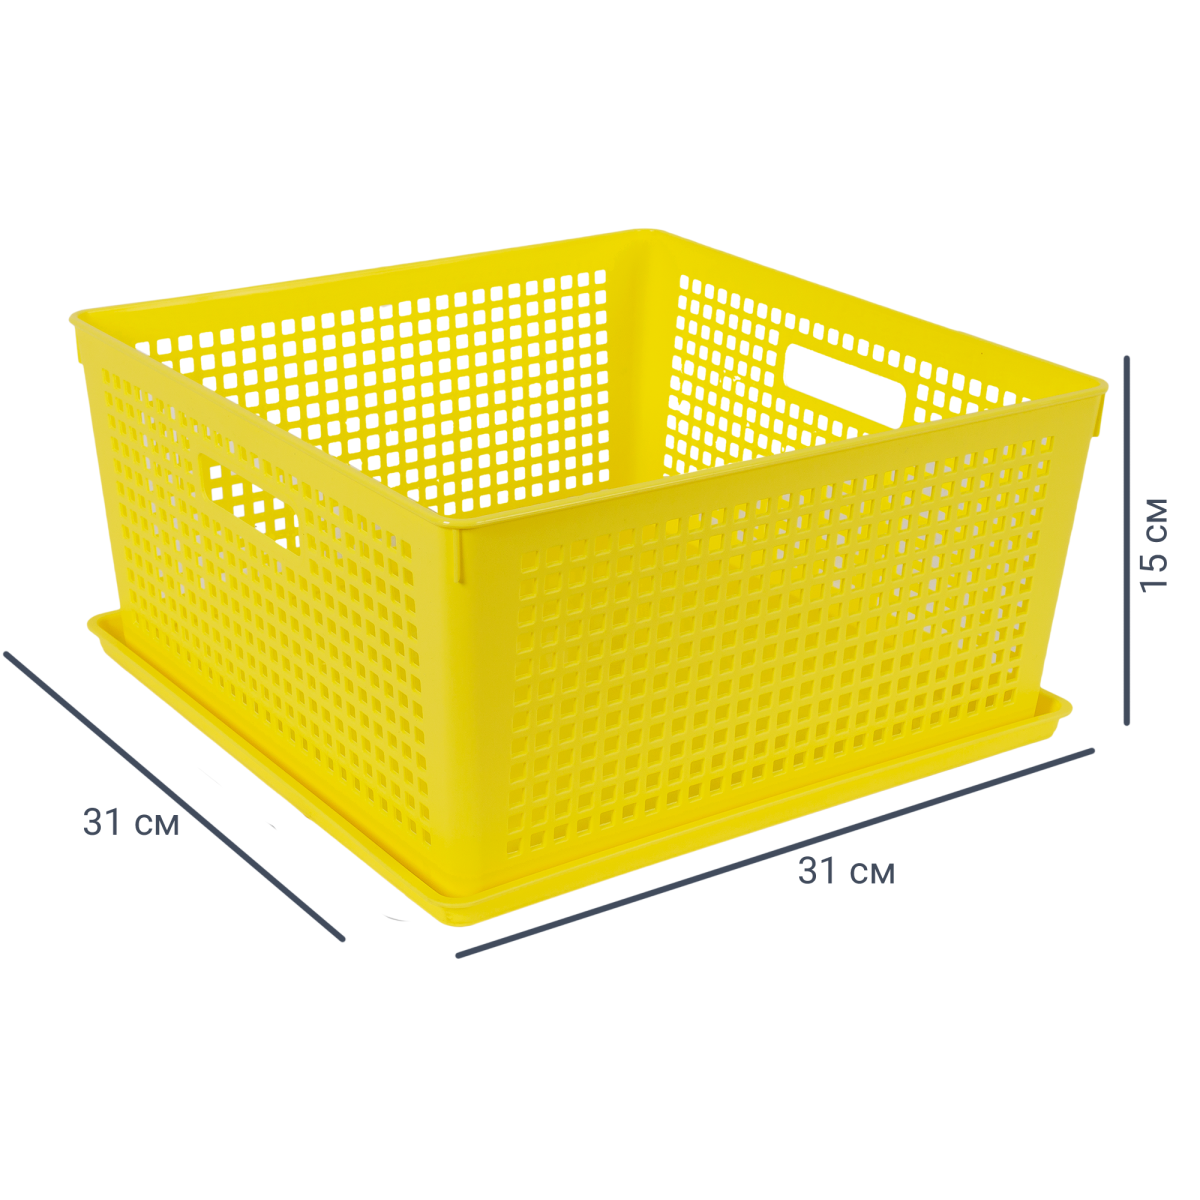 Лоток с крышкой 310x310x150 мм 12 л цвет жёлтый